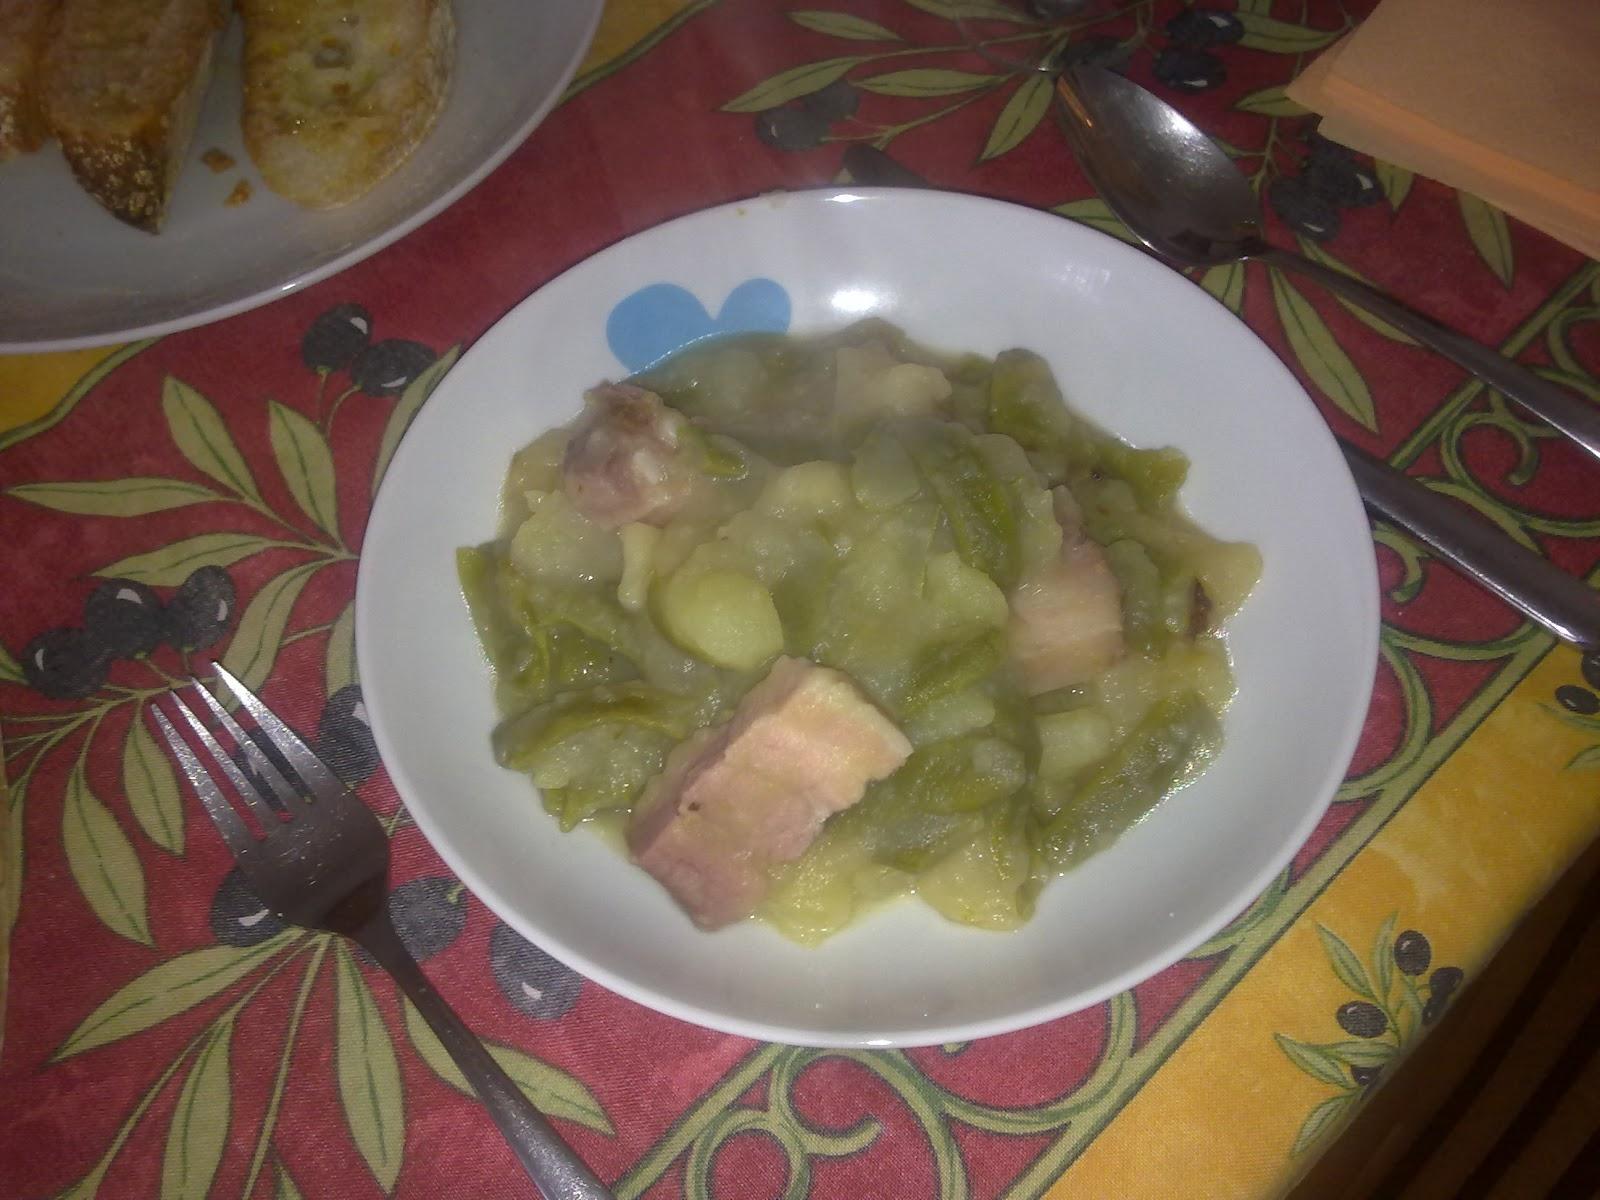 Bacon amb mongeta patata i peres 14feb2012 ngel i - Tiempo de coccion de judias verdes ...